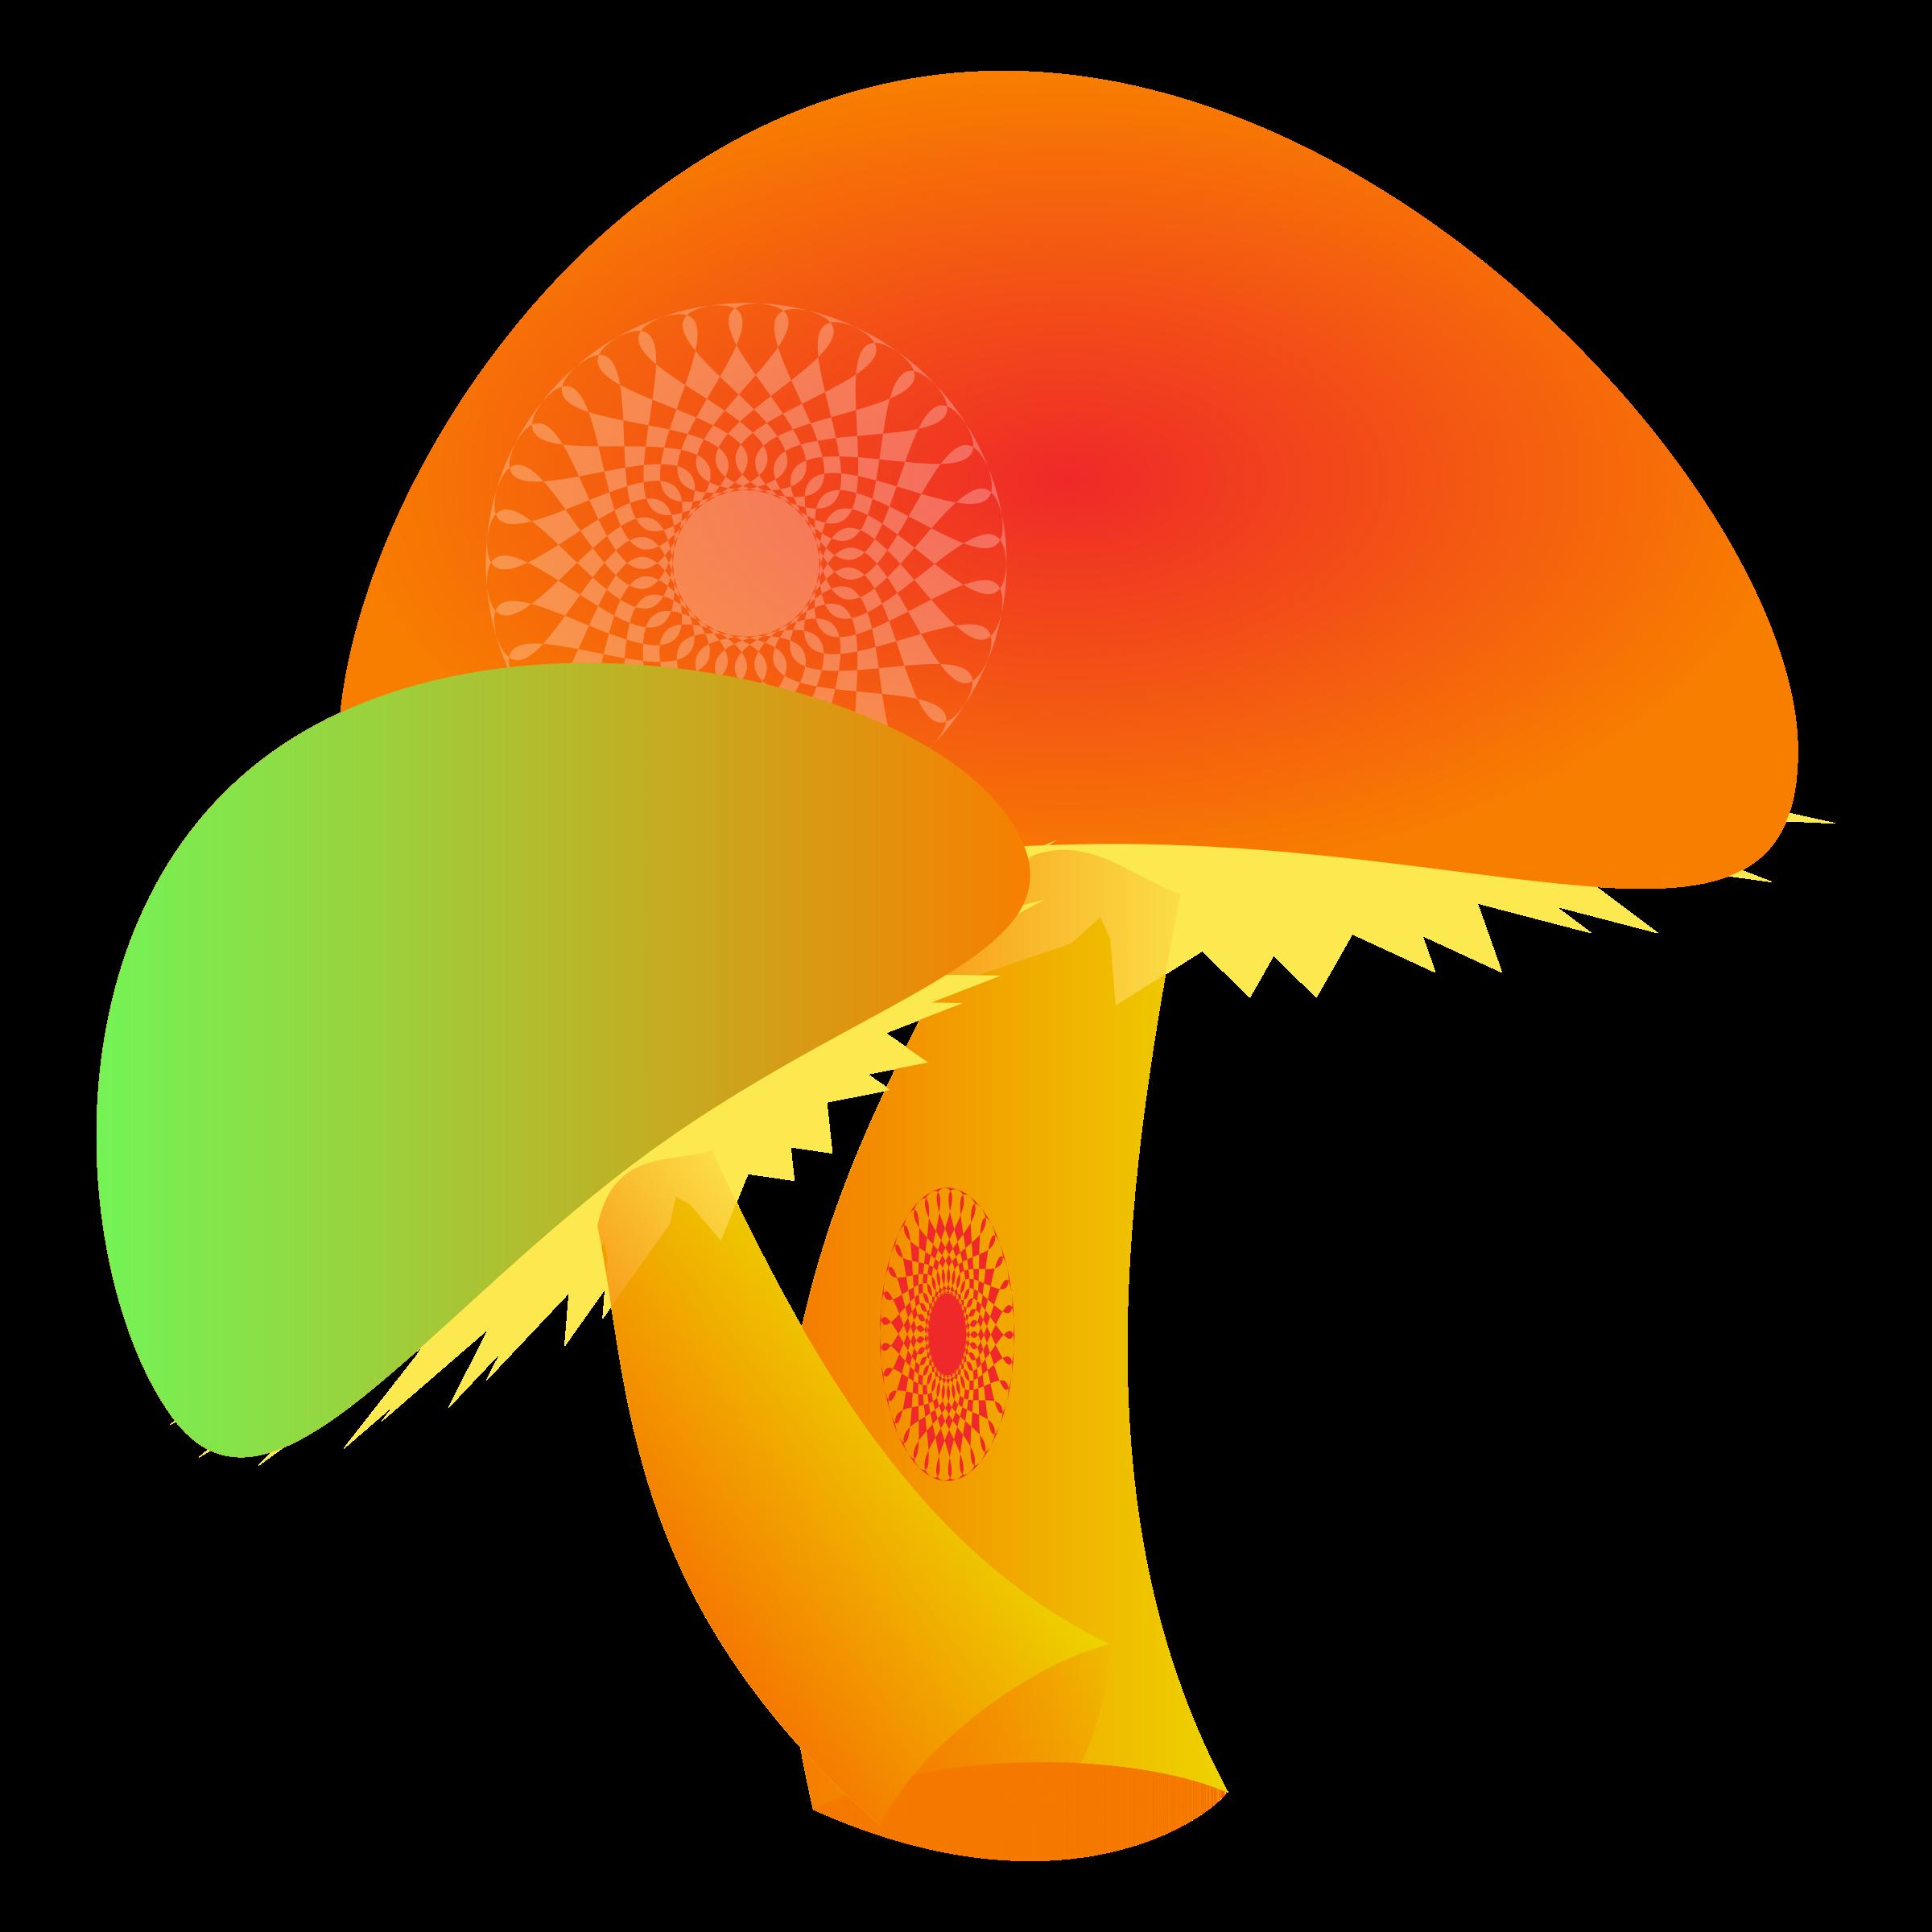 Mushroom yellow mushroom